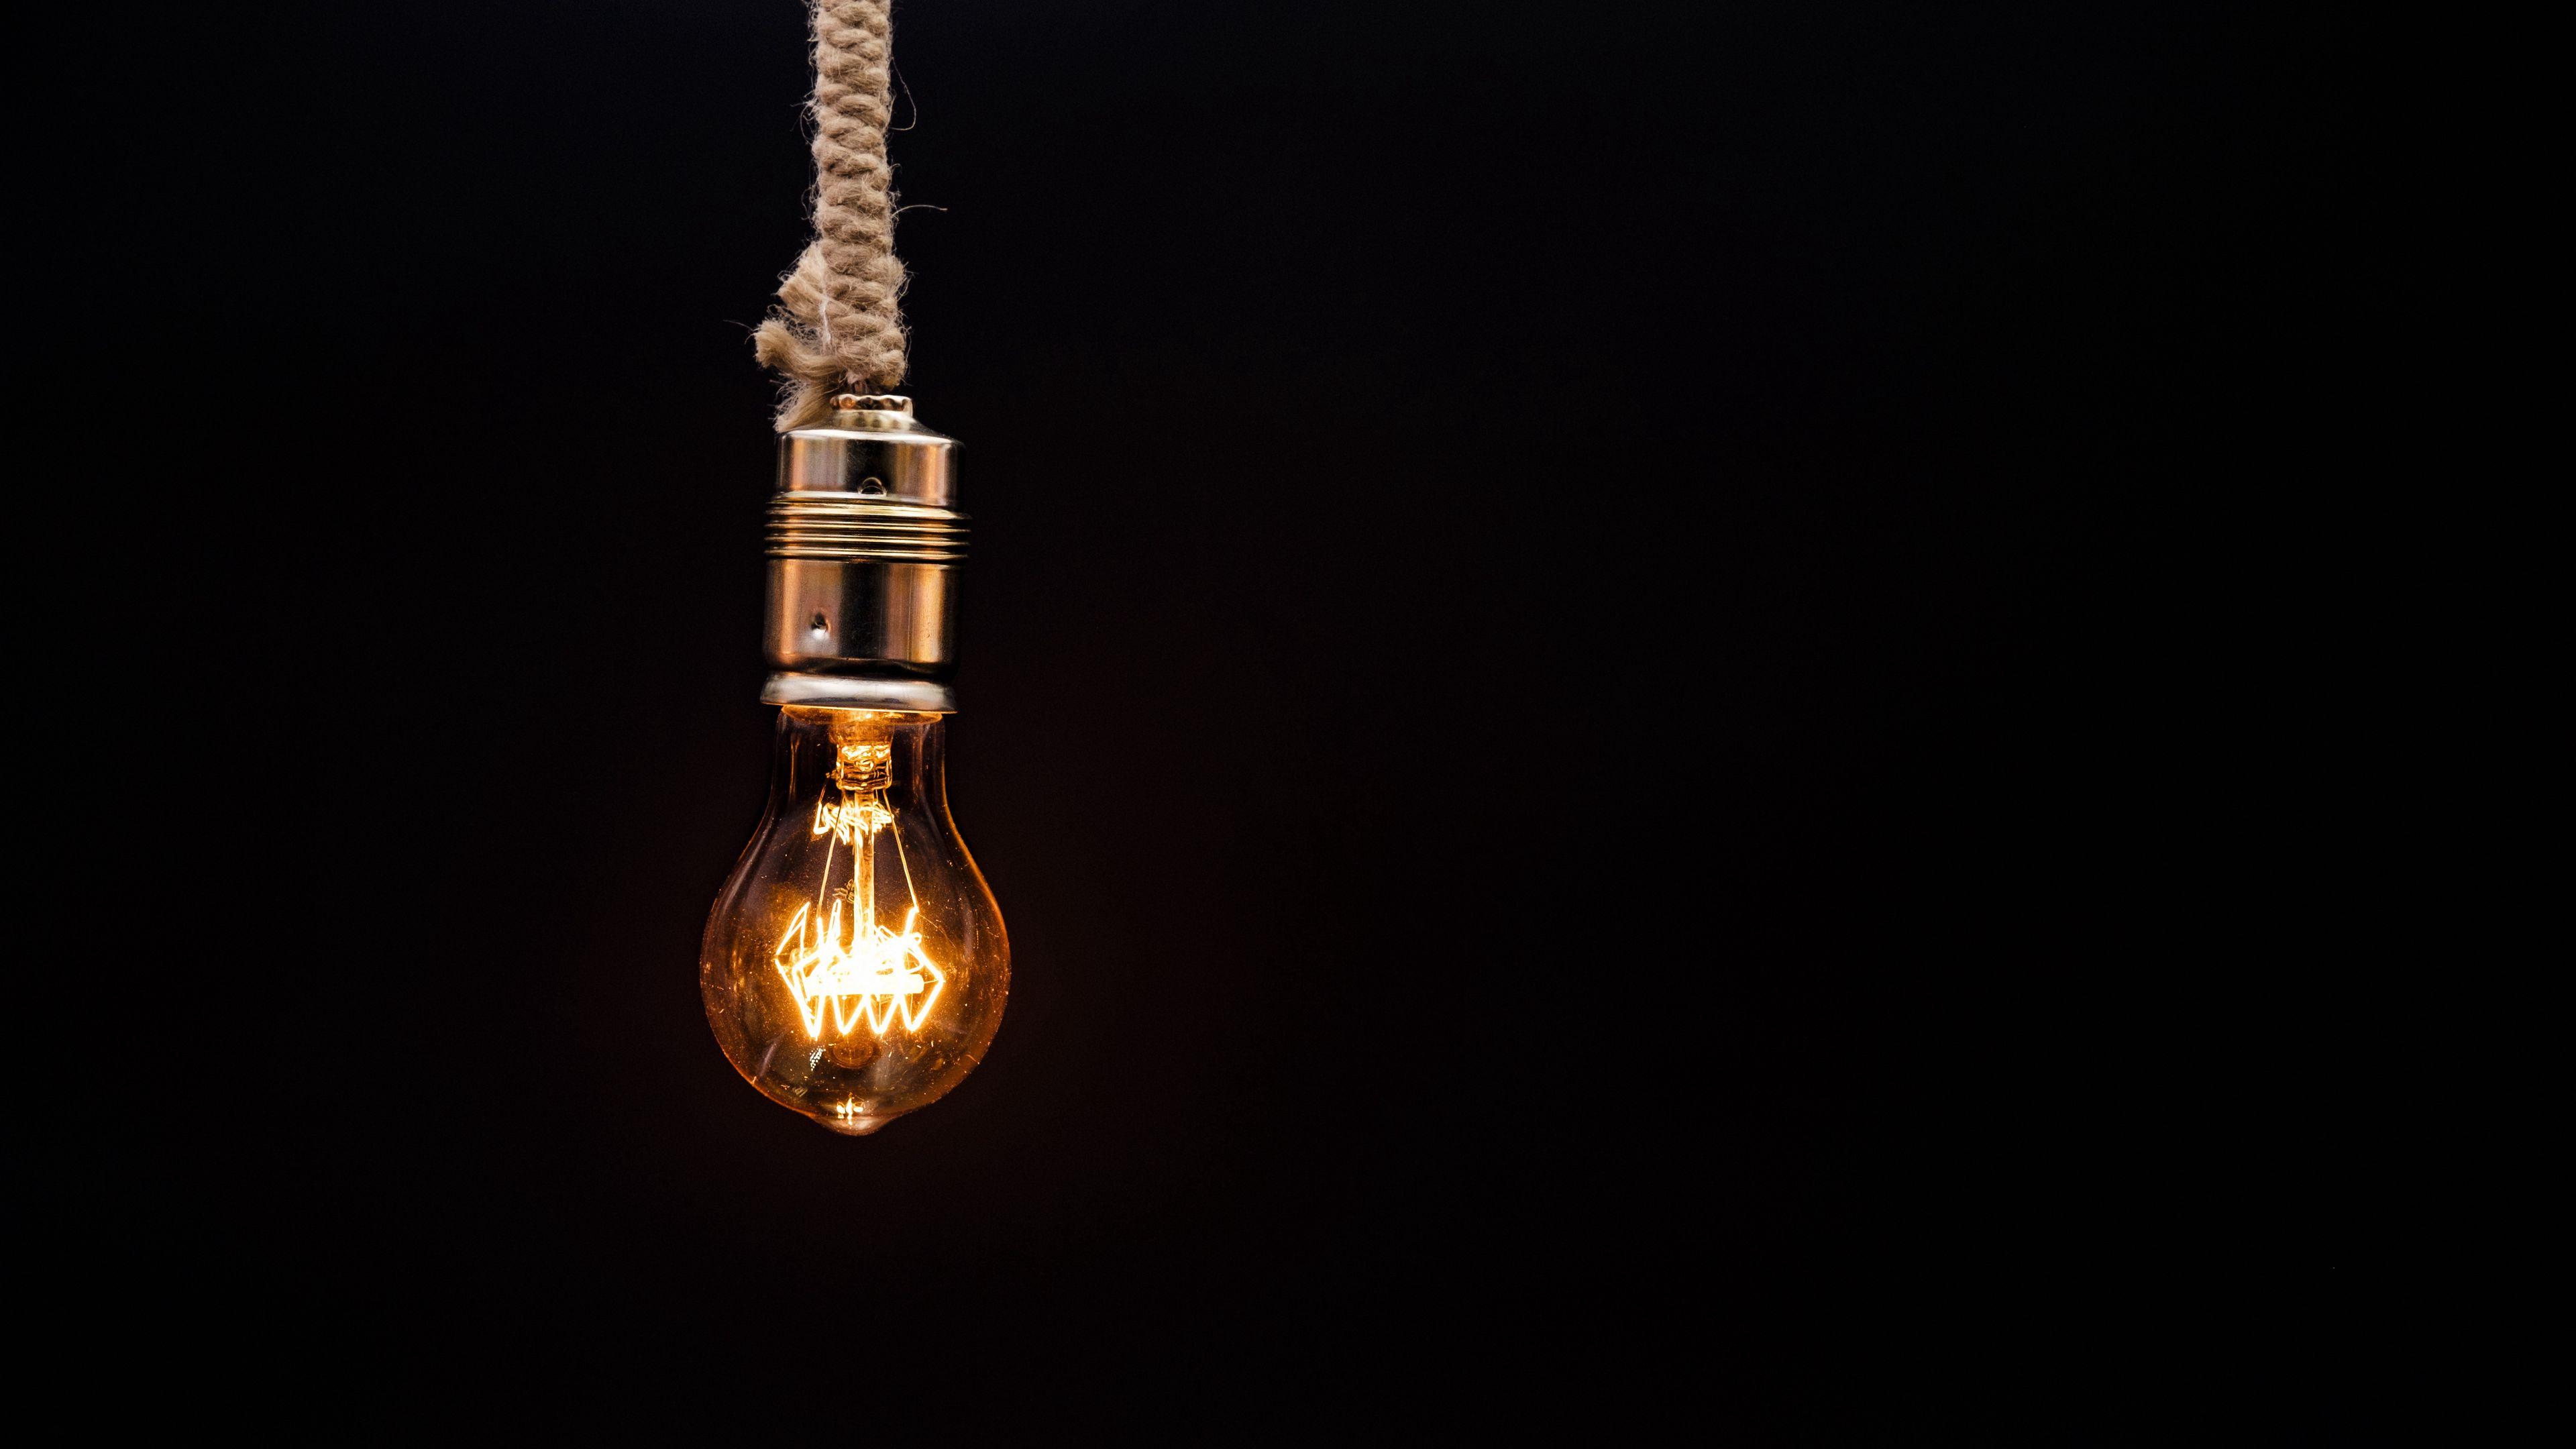 3840x2160 Wallpaper bulb, lighting, rope, electricity, edisons lamp